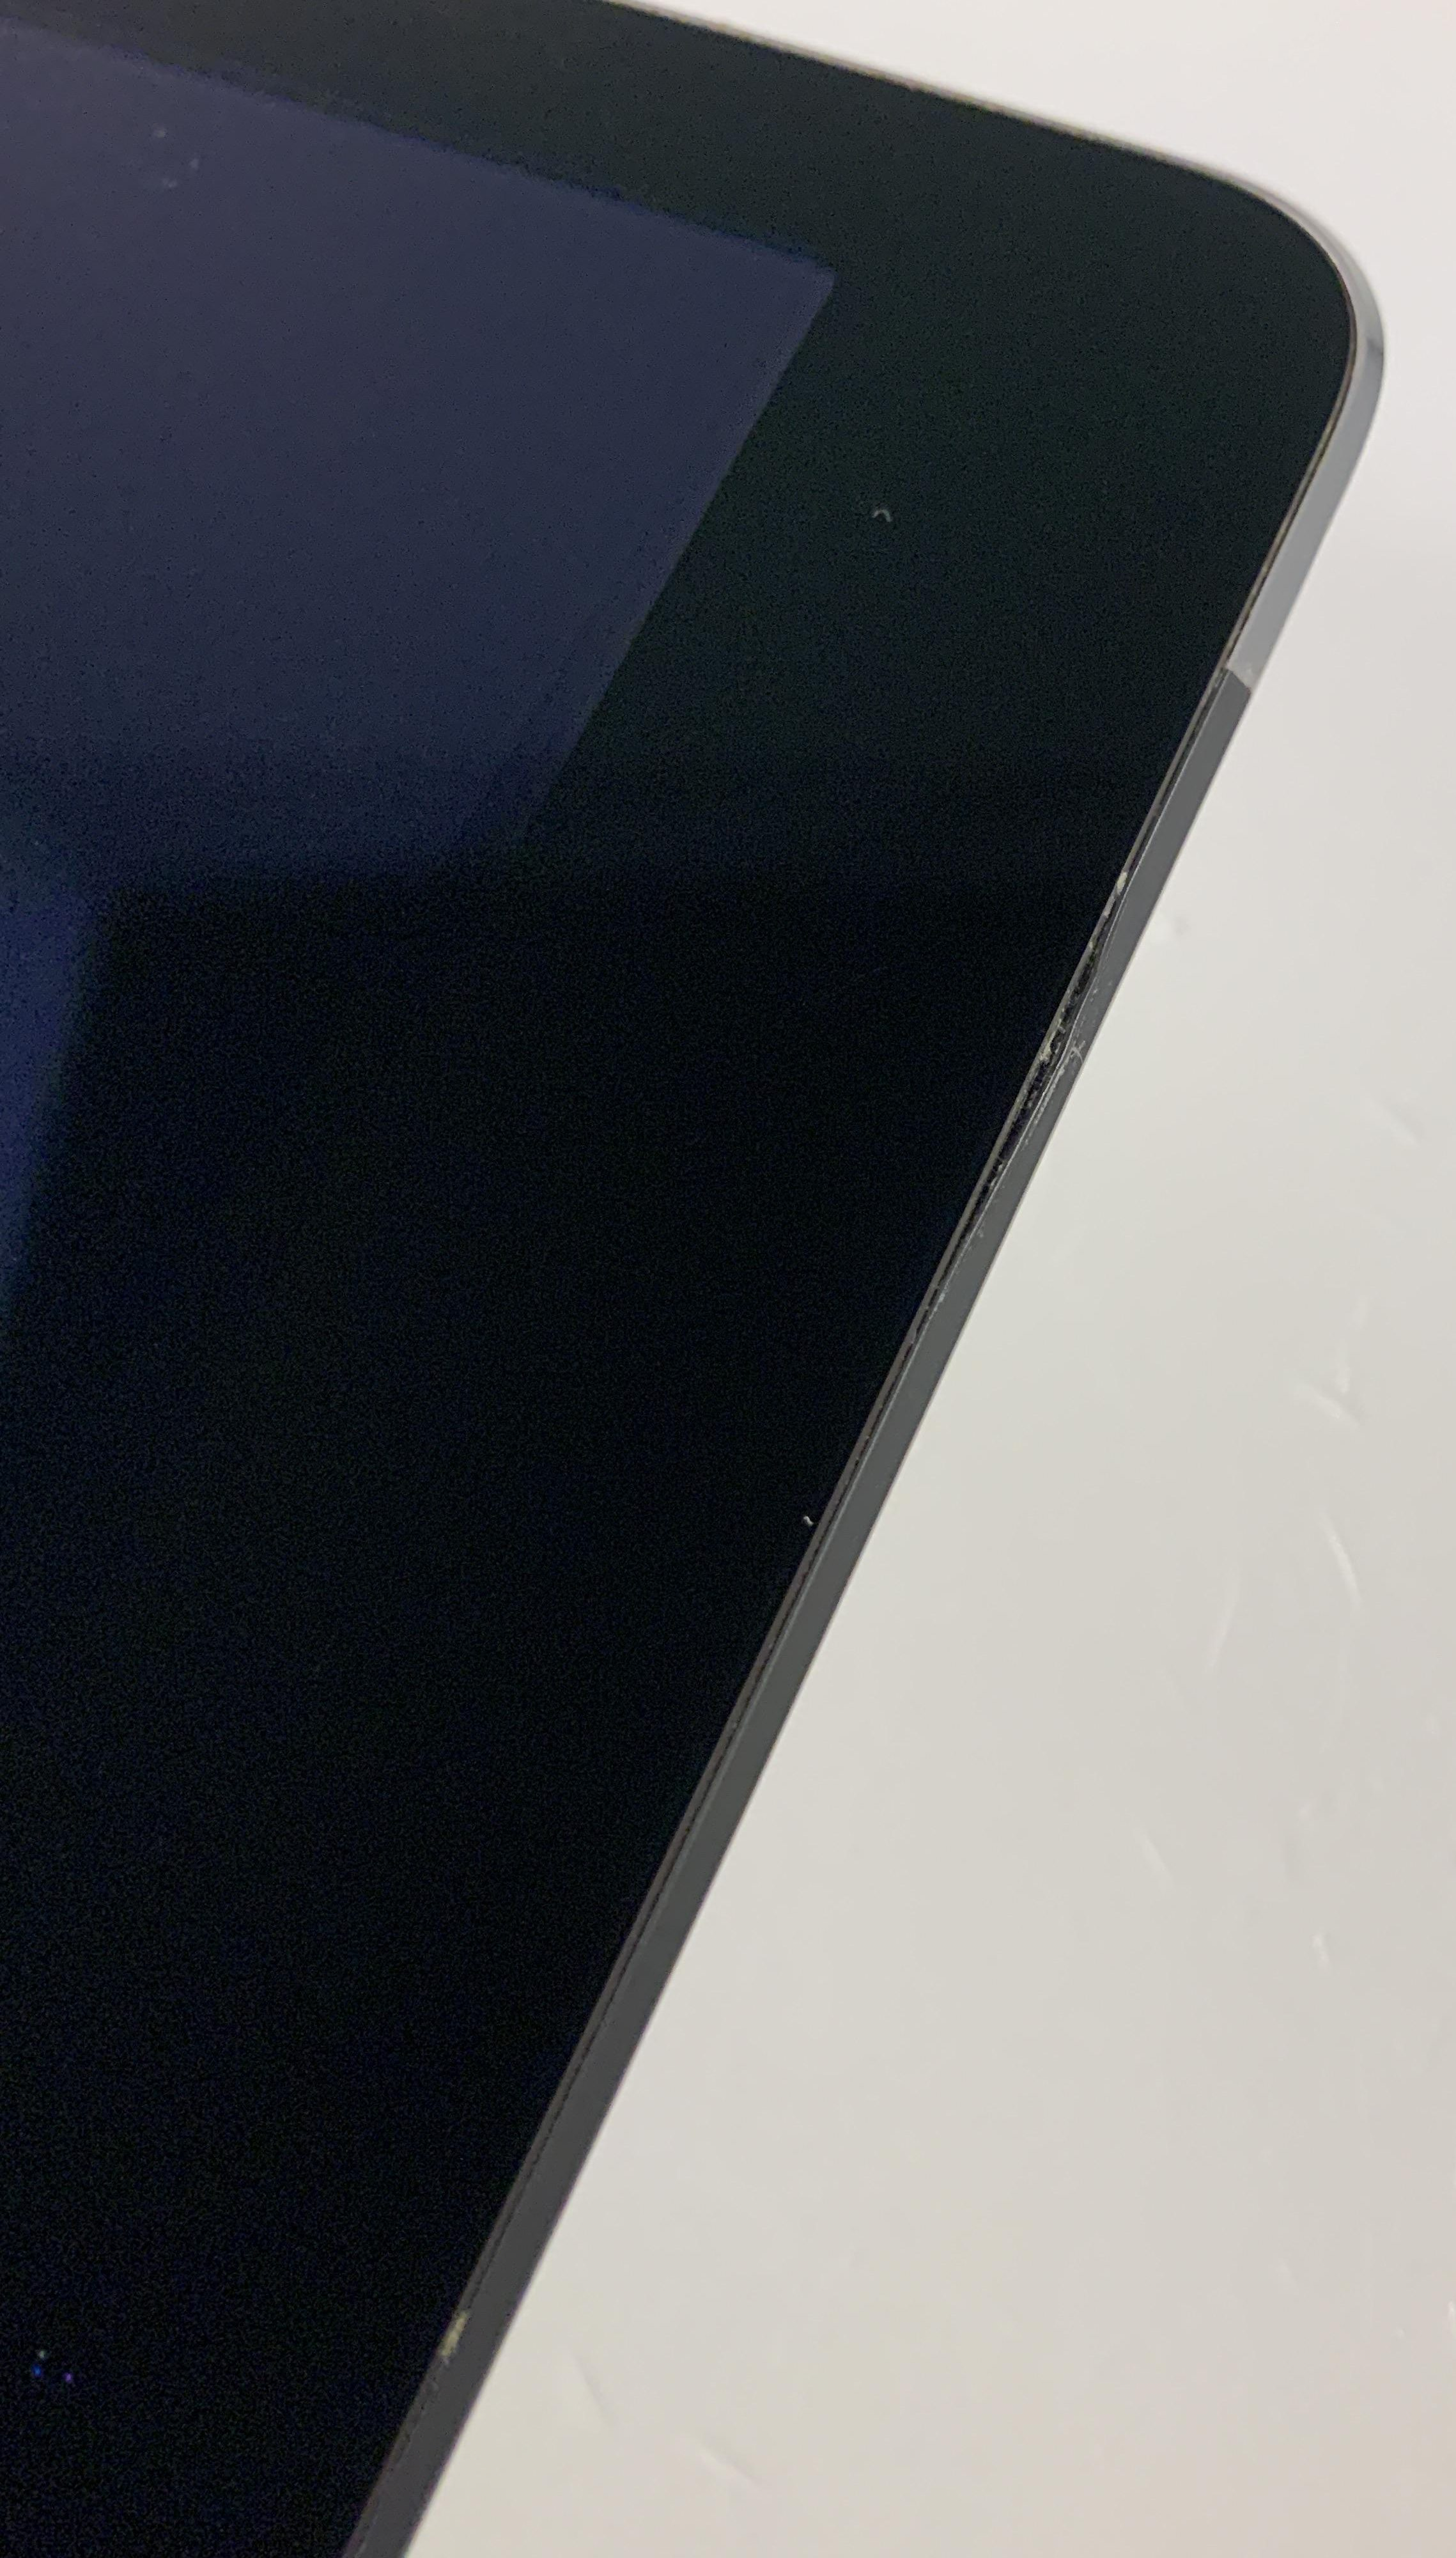 iPad Air 2 Wi-Fi + Cellular 64GB, 64GB, Space Gray, Kuva 5